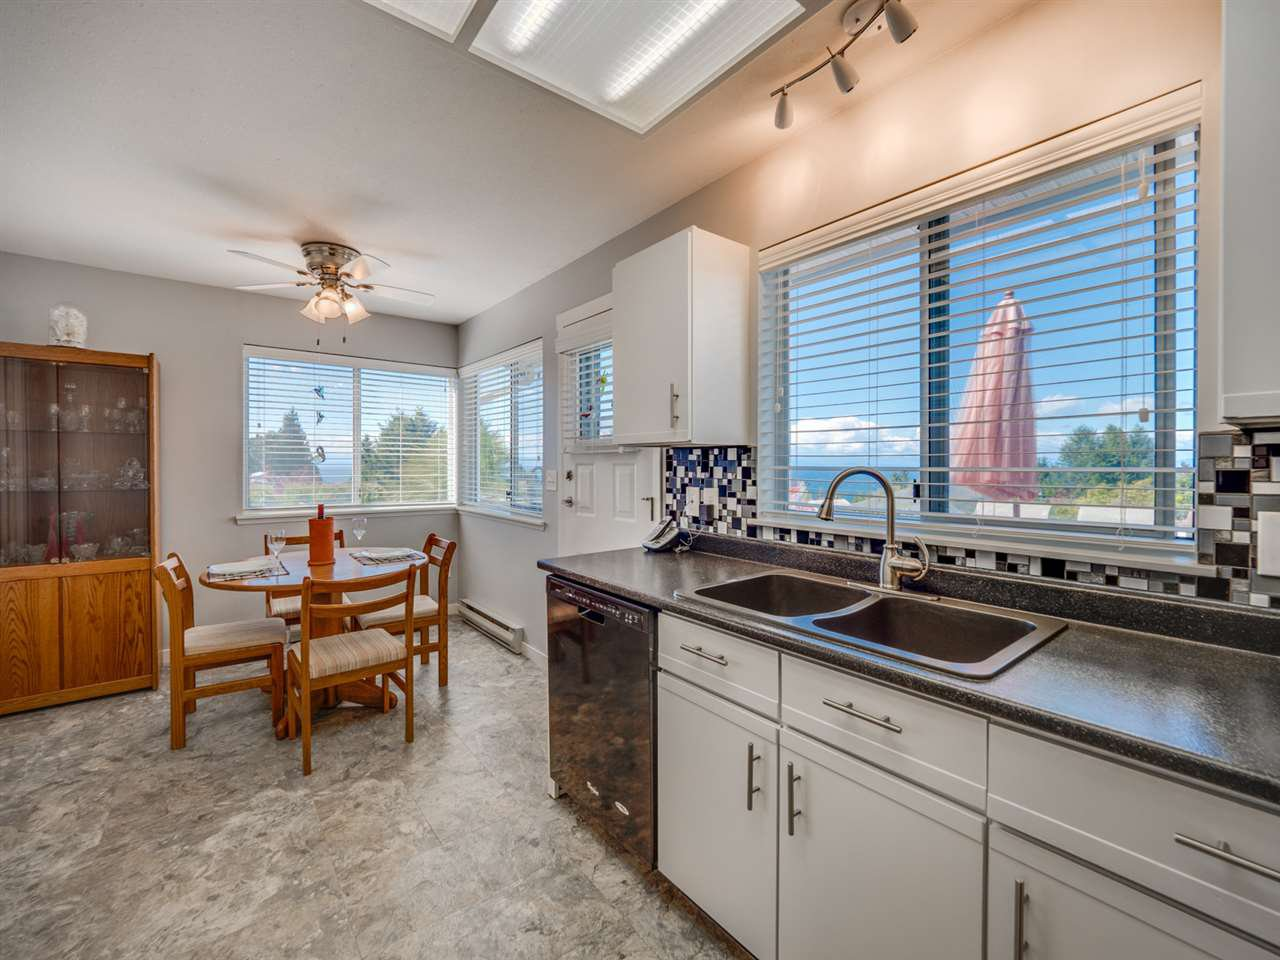 Photo 5: Photos: 4983 ARBUTUS Road in Sechelt: Sechelt District House for sale (Sunshine Coast)  : MLS®# R2427502